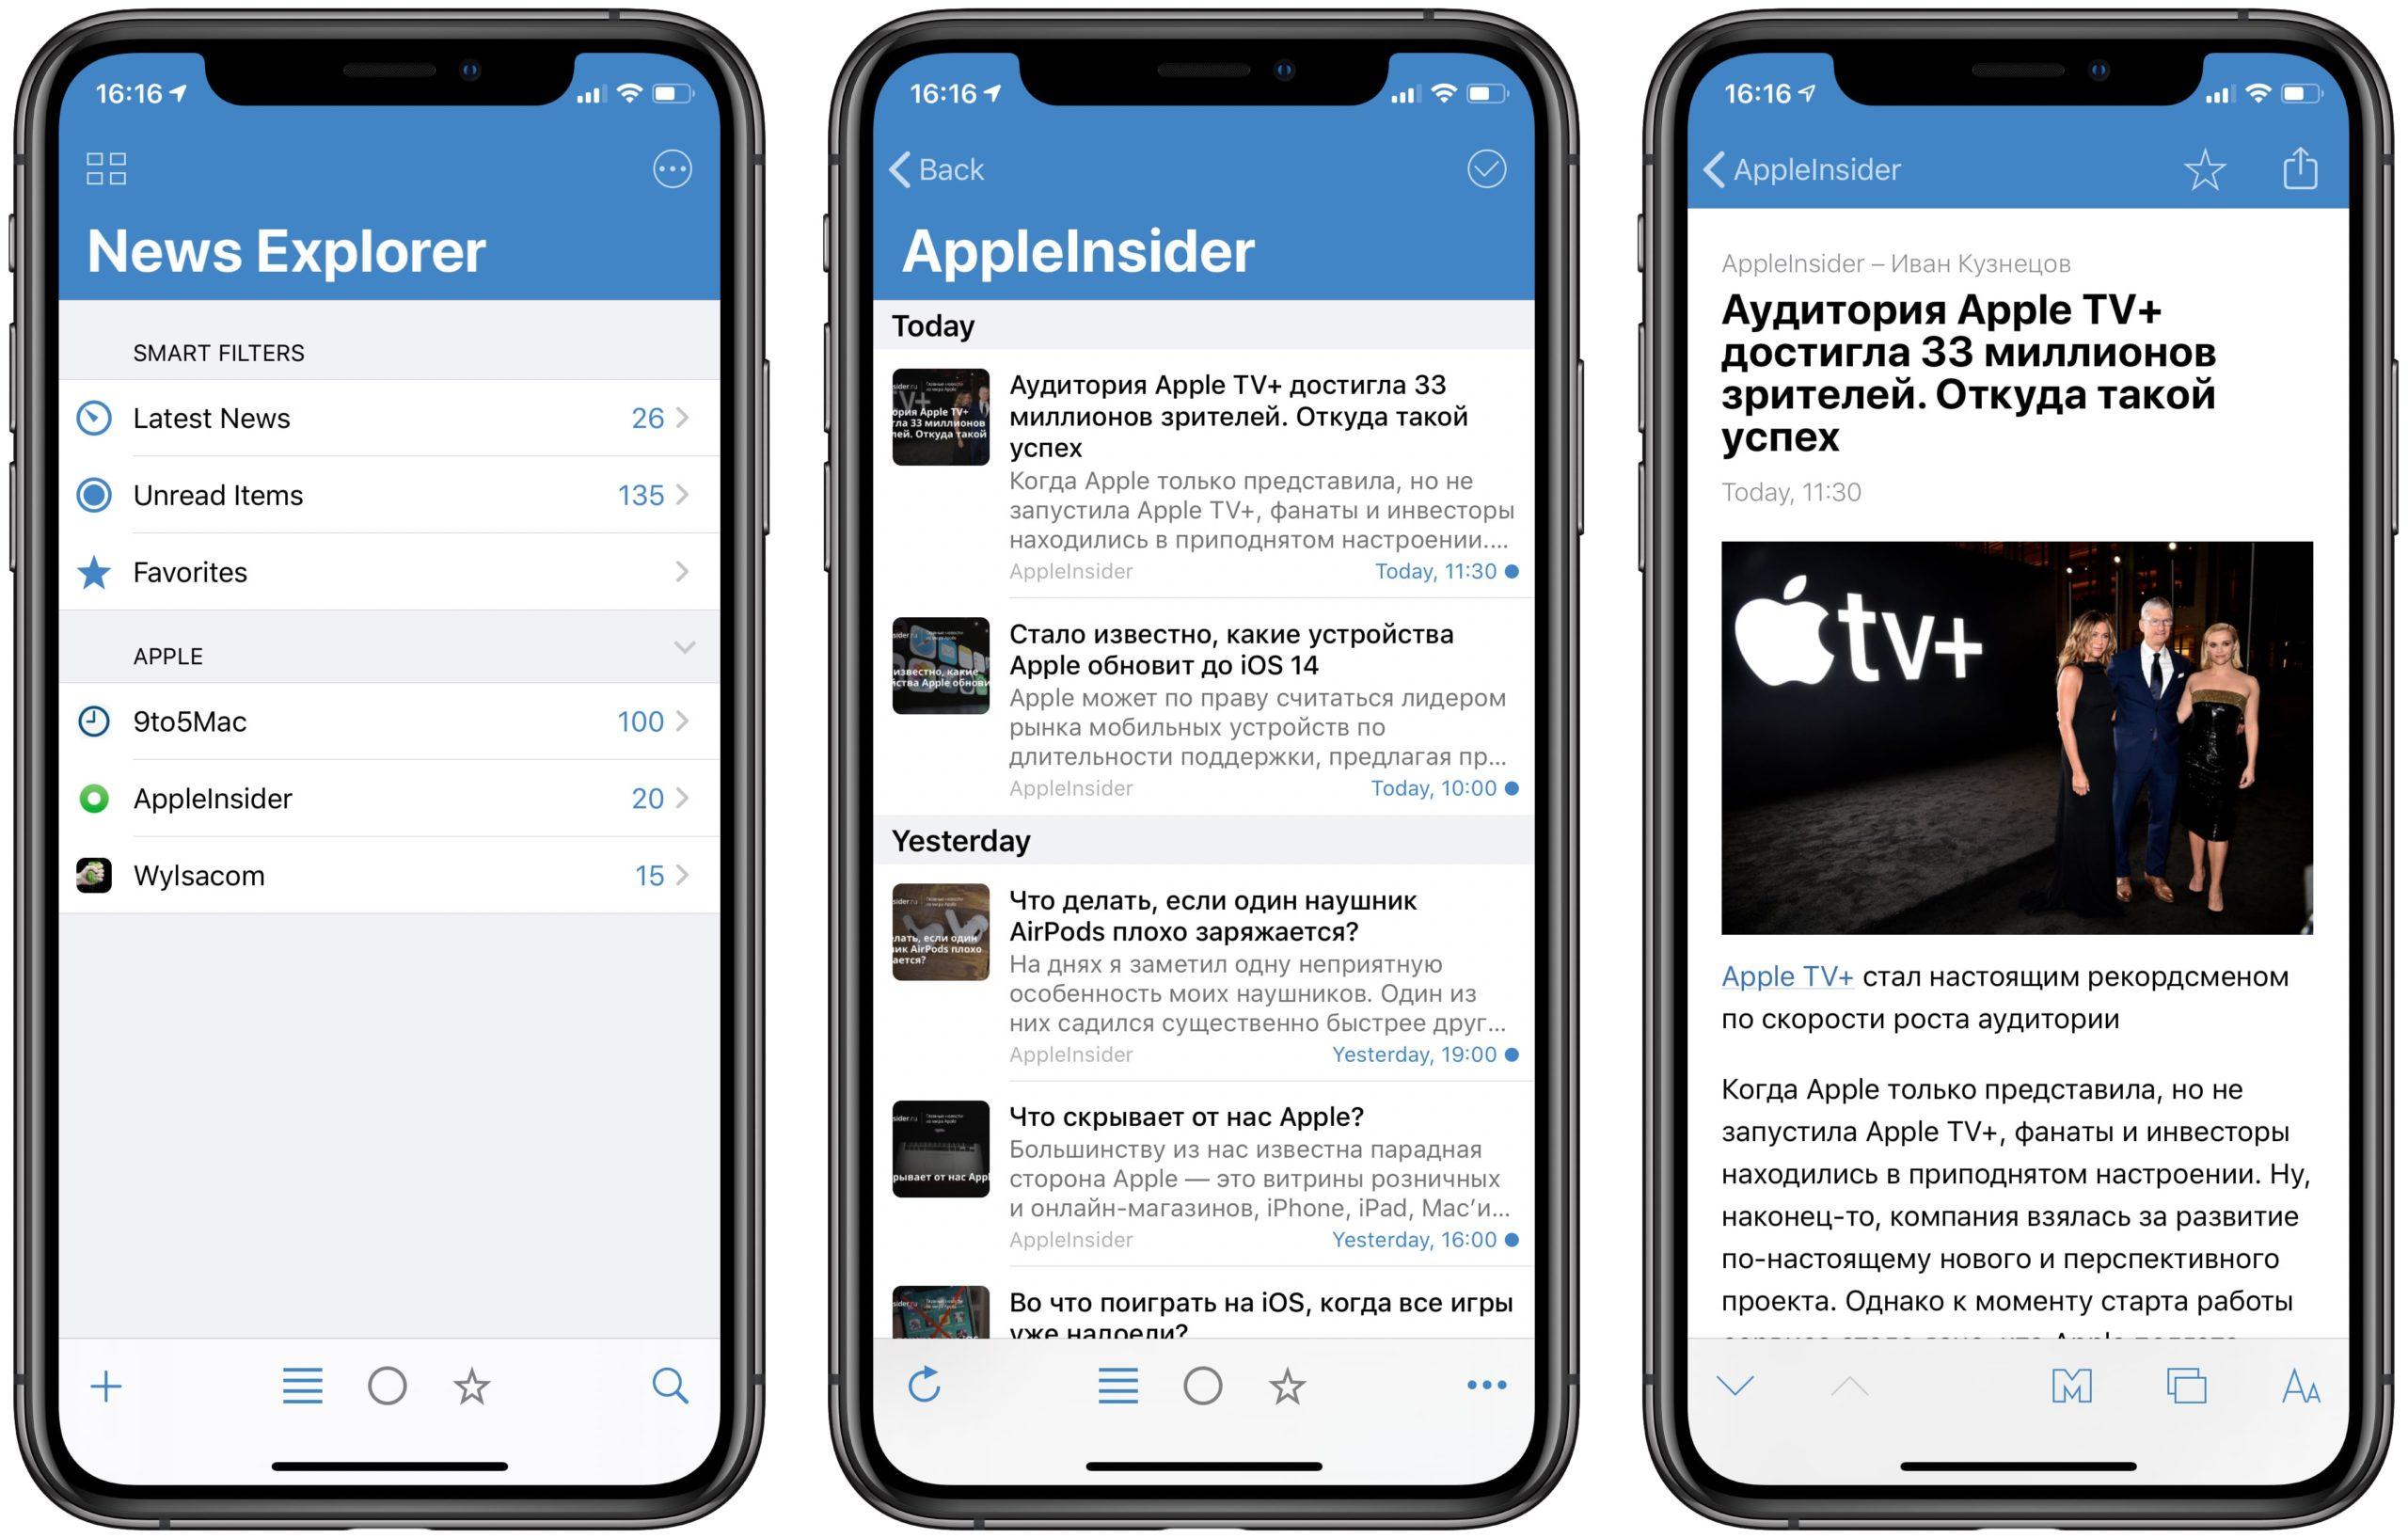 News Explorer iOS, iPhone